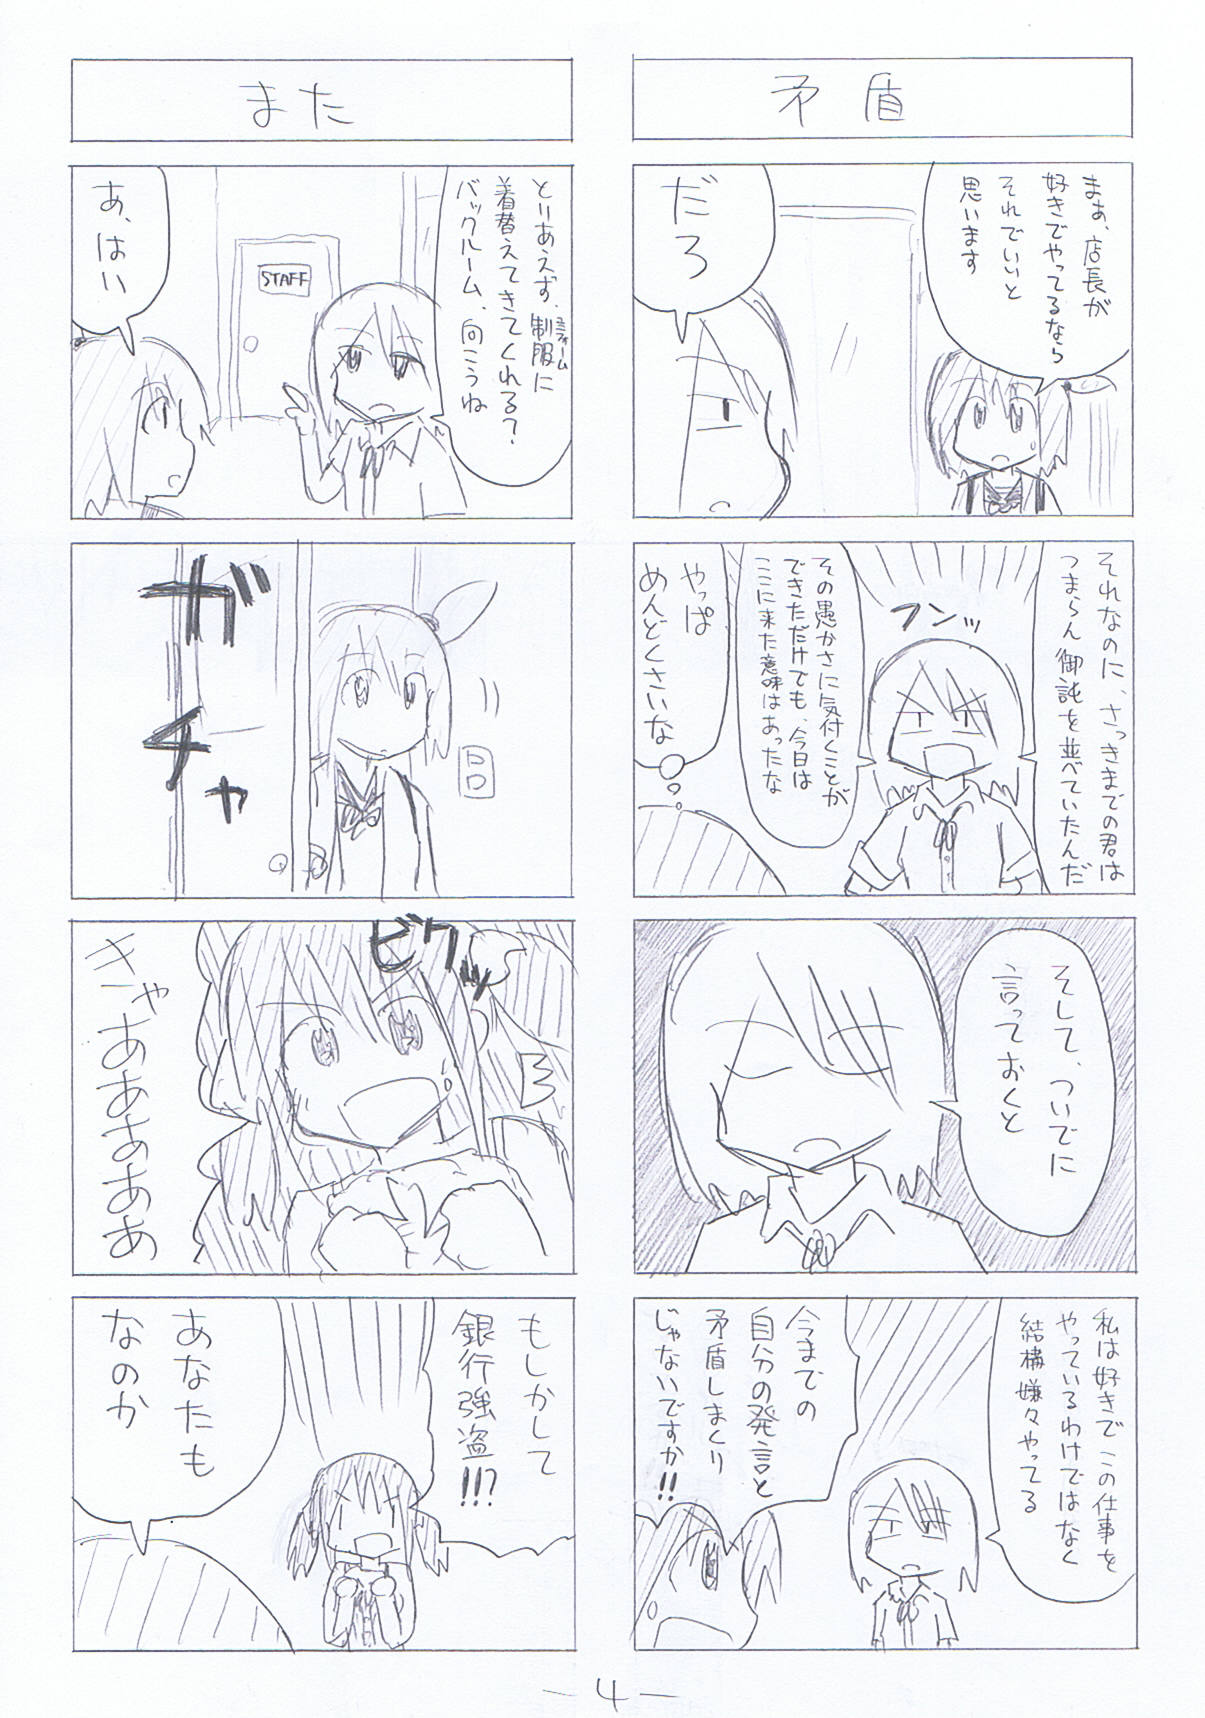 hitotoki-1-4.jpg